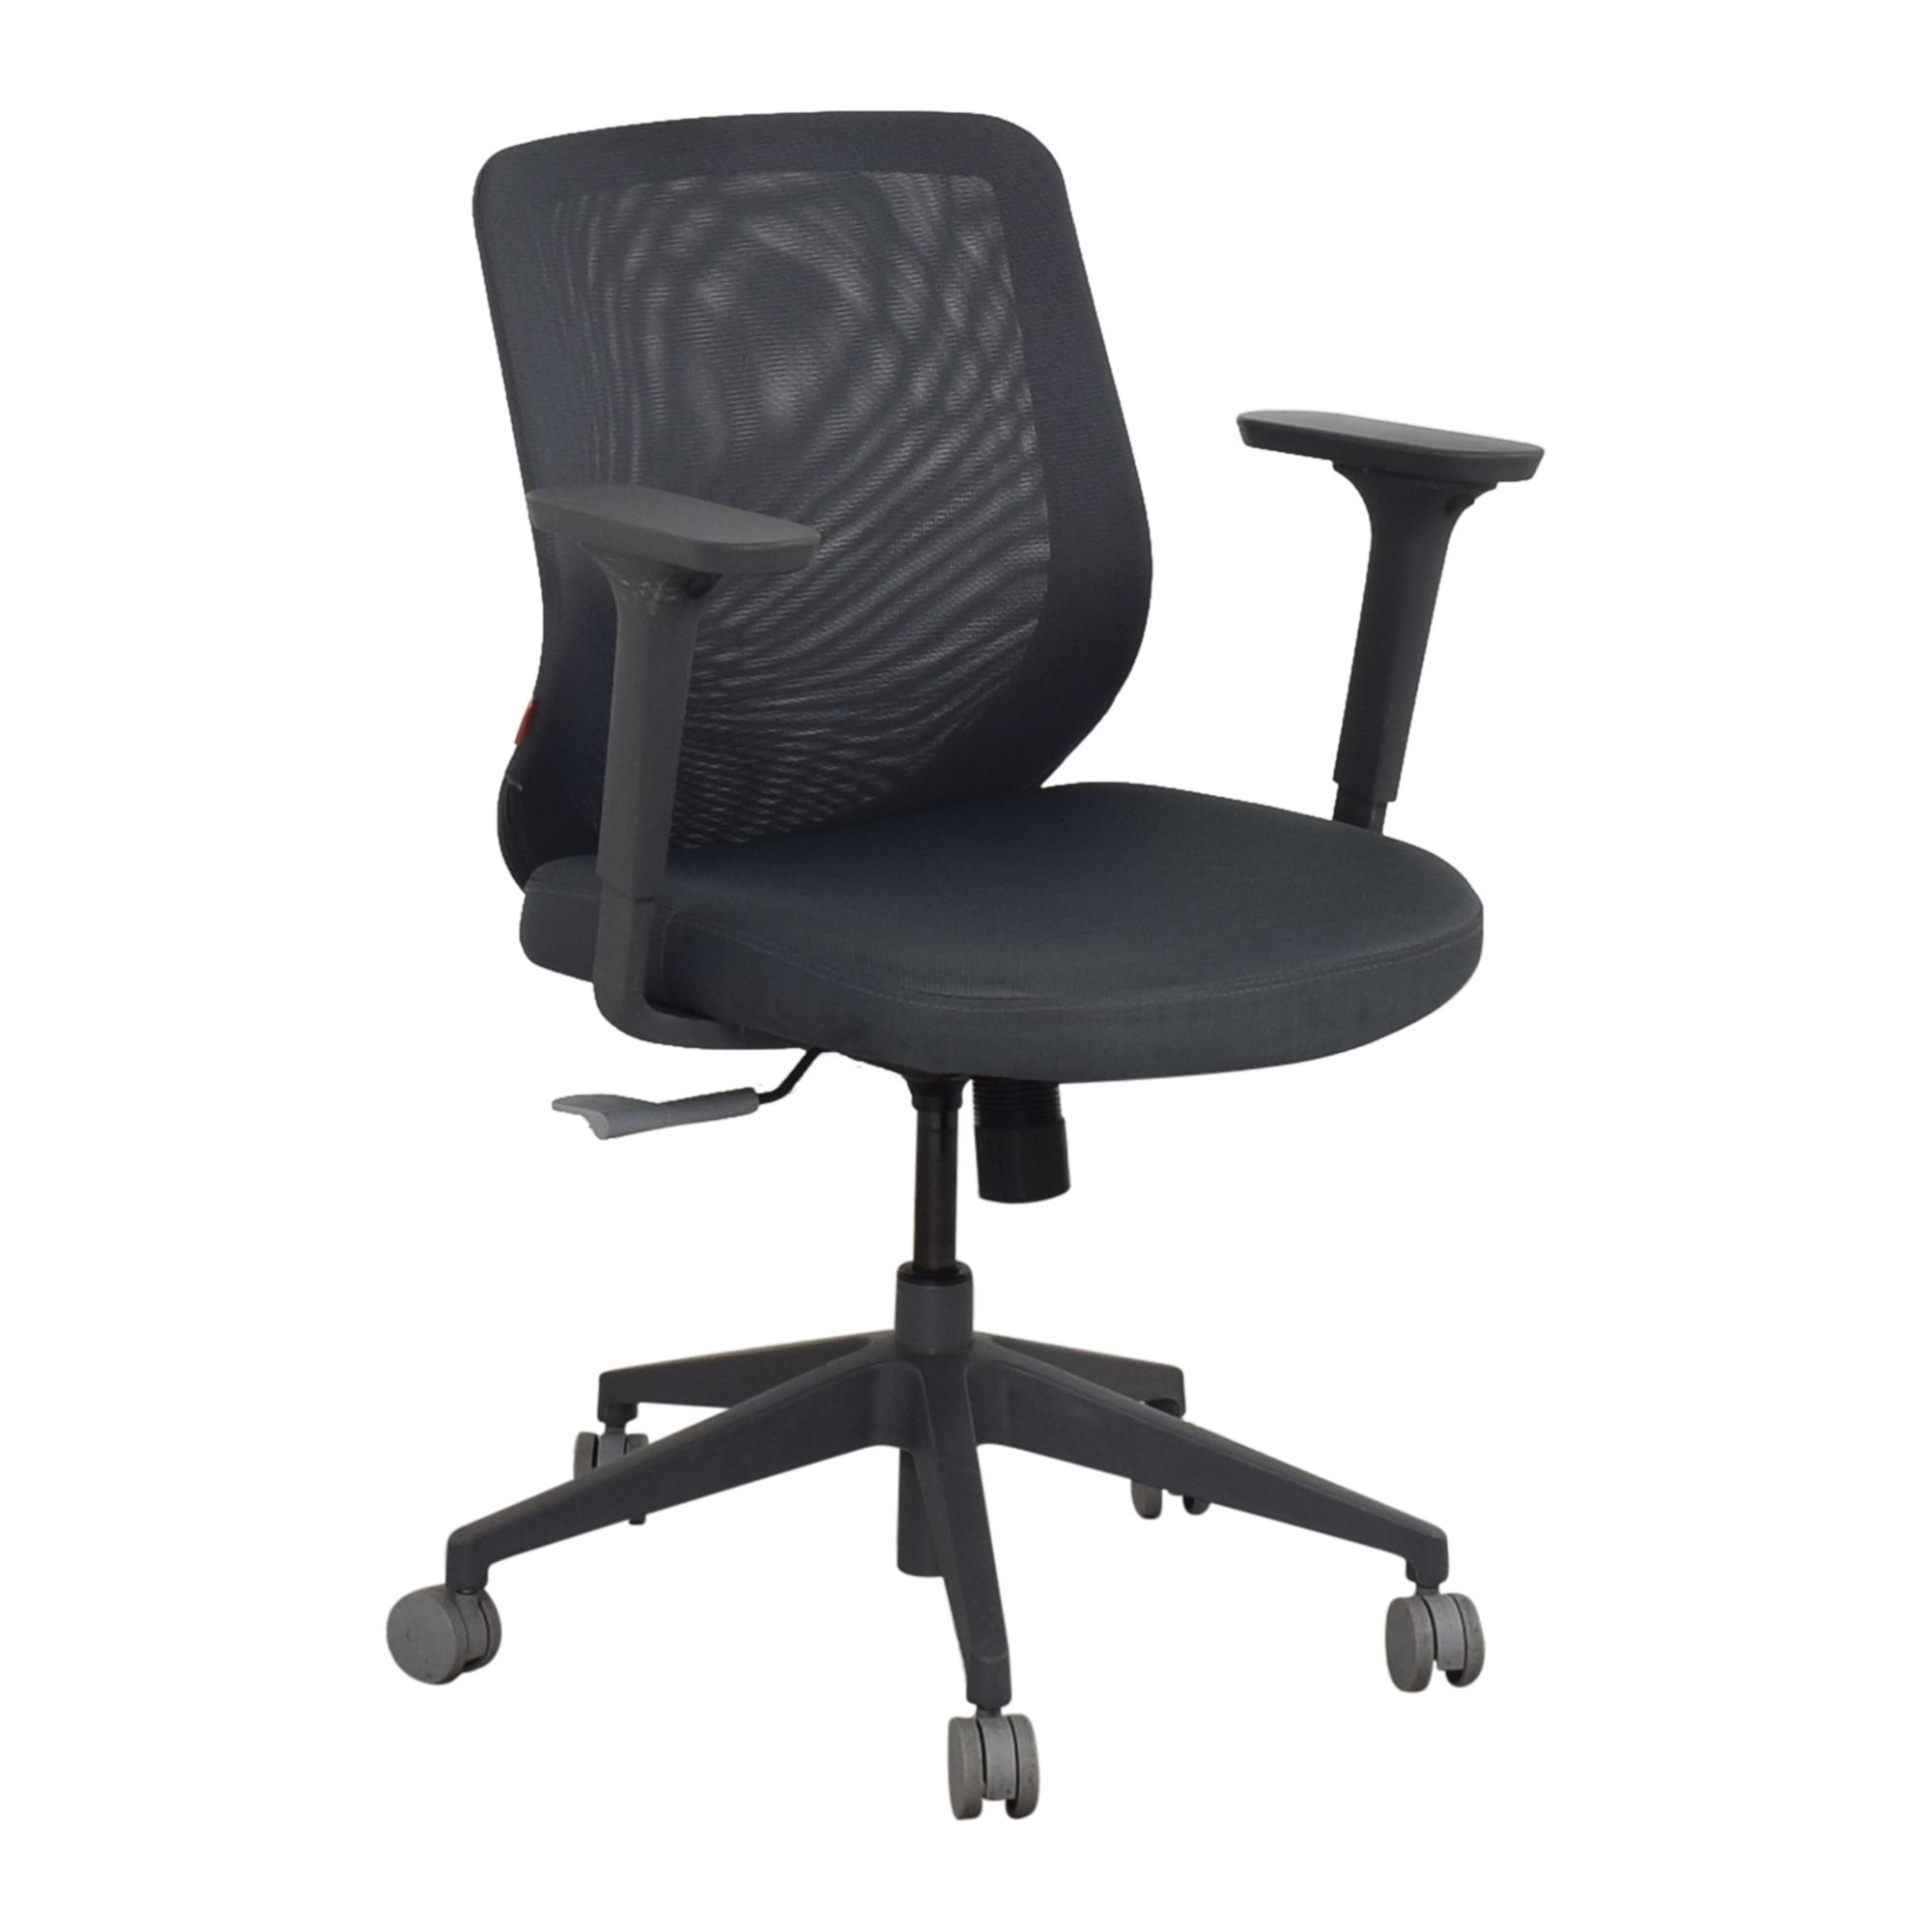 Poppin Poppin Max Task Chair gray